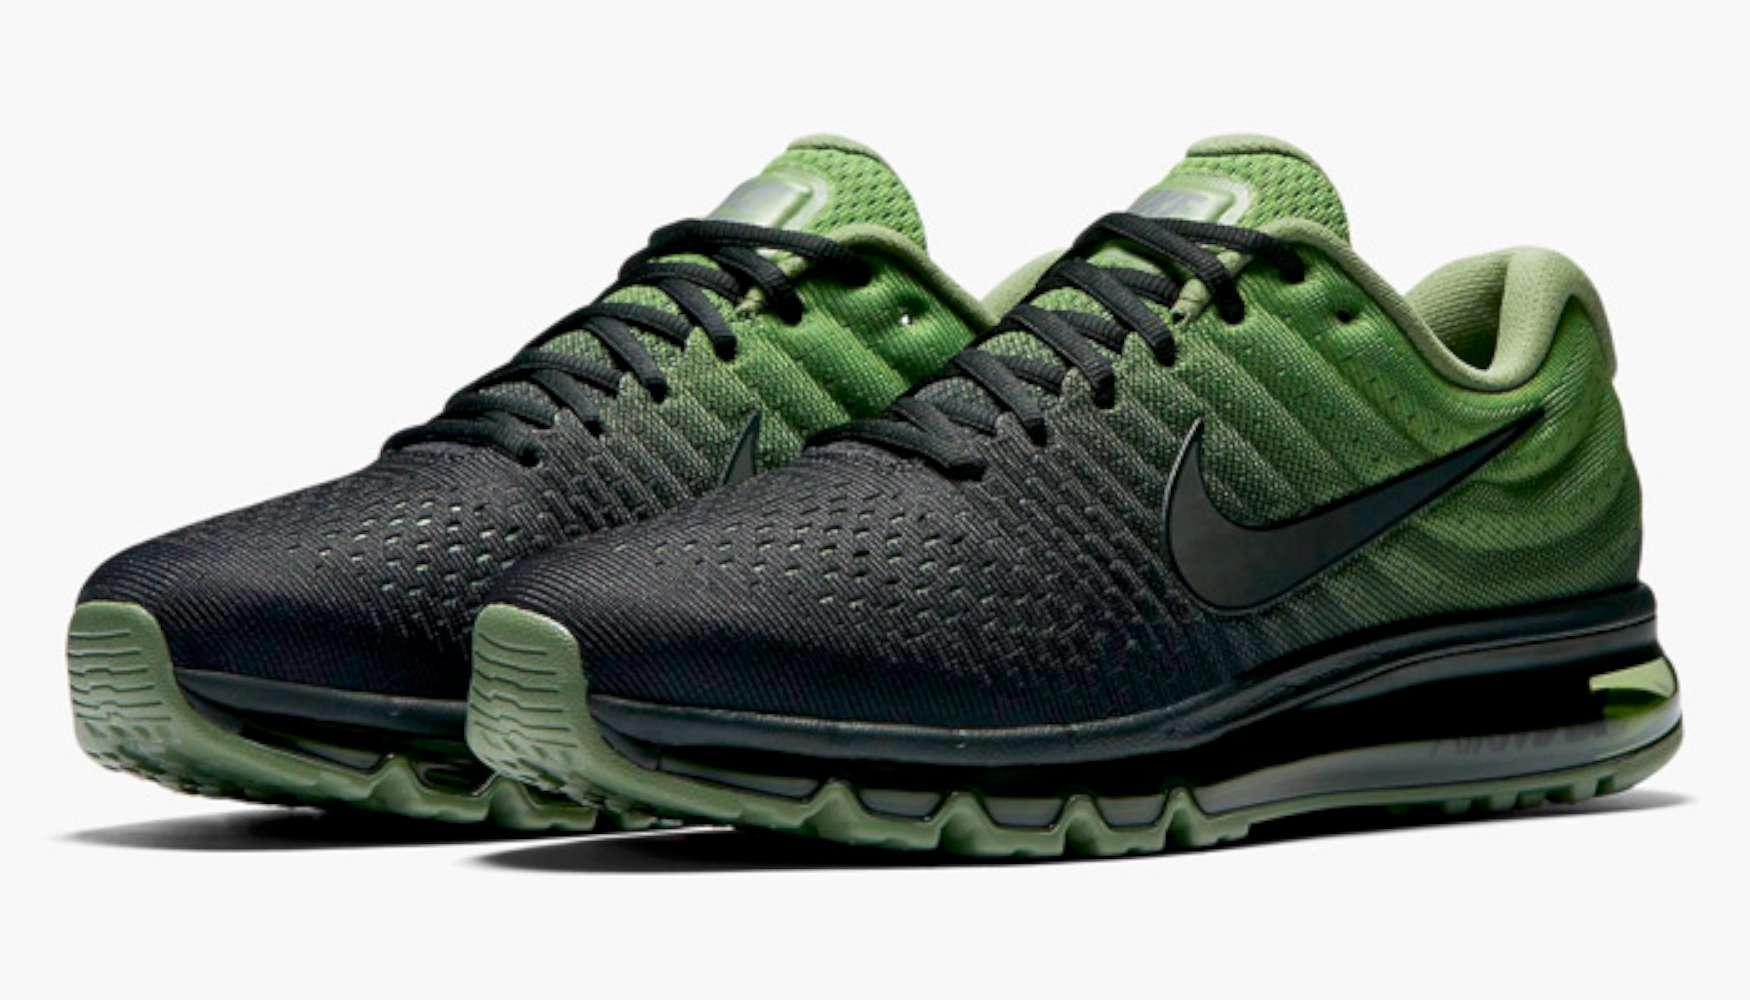 Mens 2017 Lace Low Palm Running Blackblack Nike Air Top Max Up dqnPTxtwH6